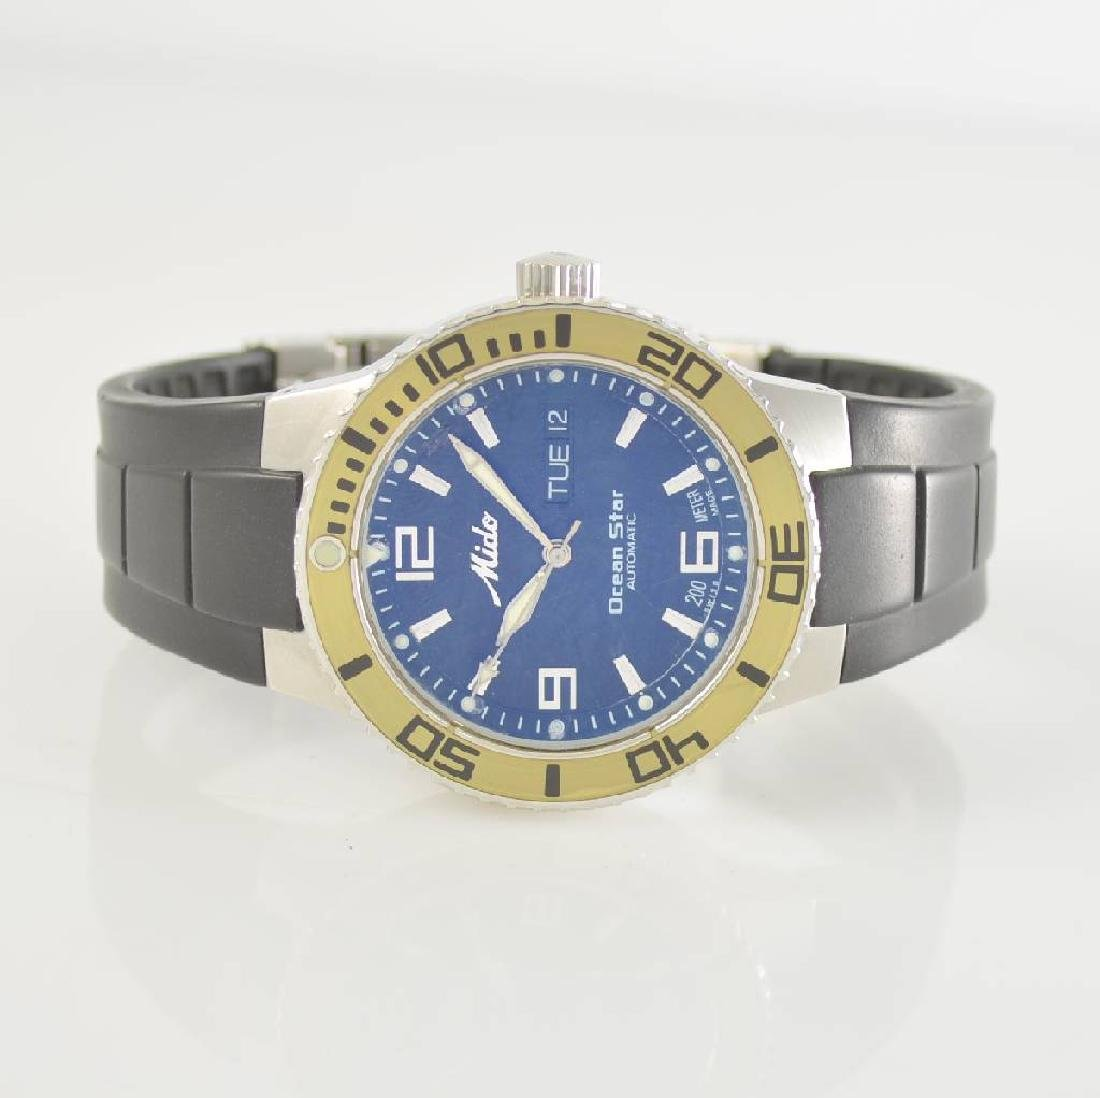 MIDO Ocean Star gents wristwatch